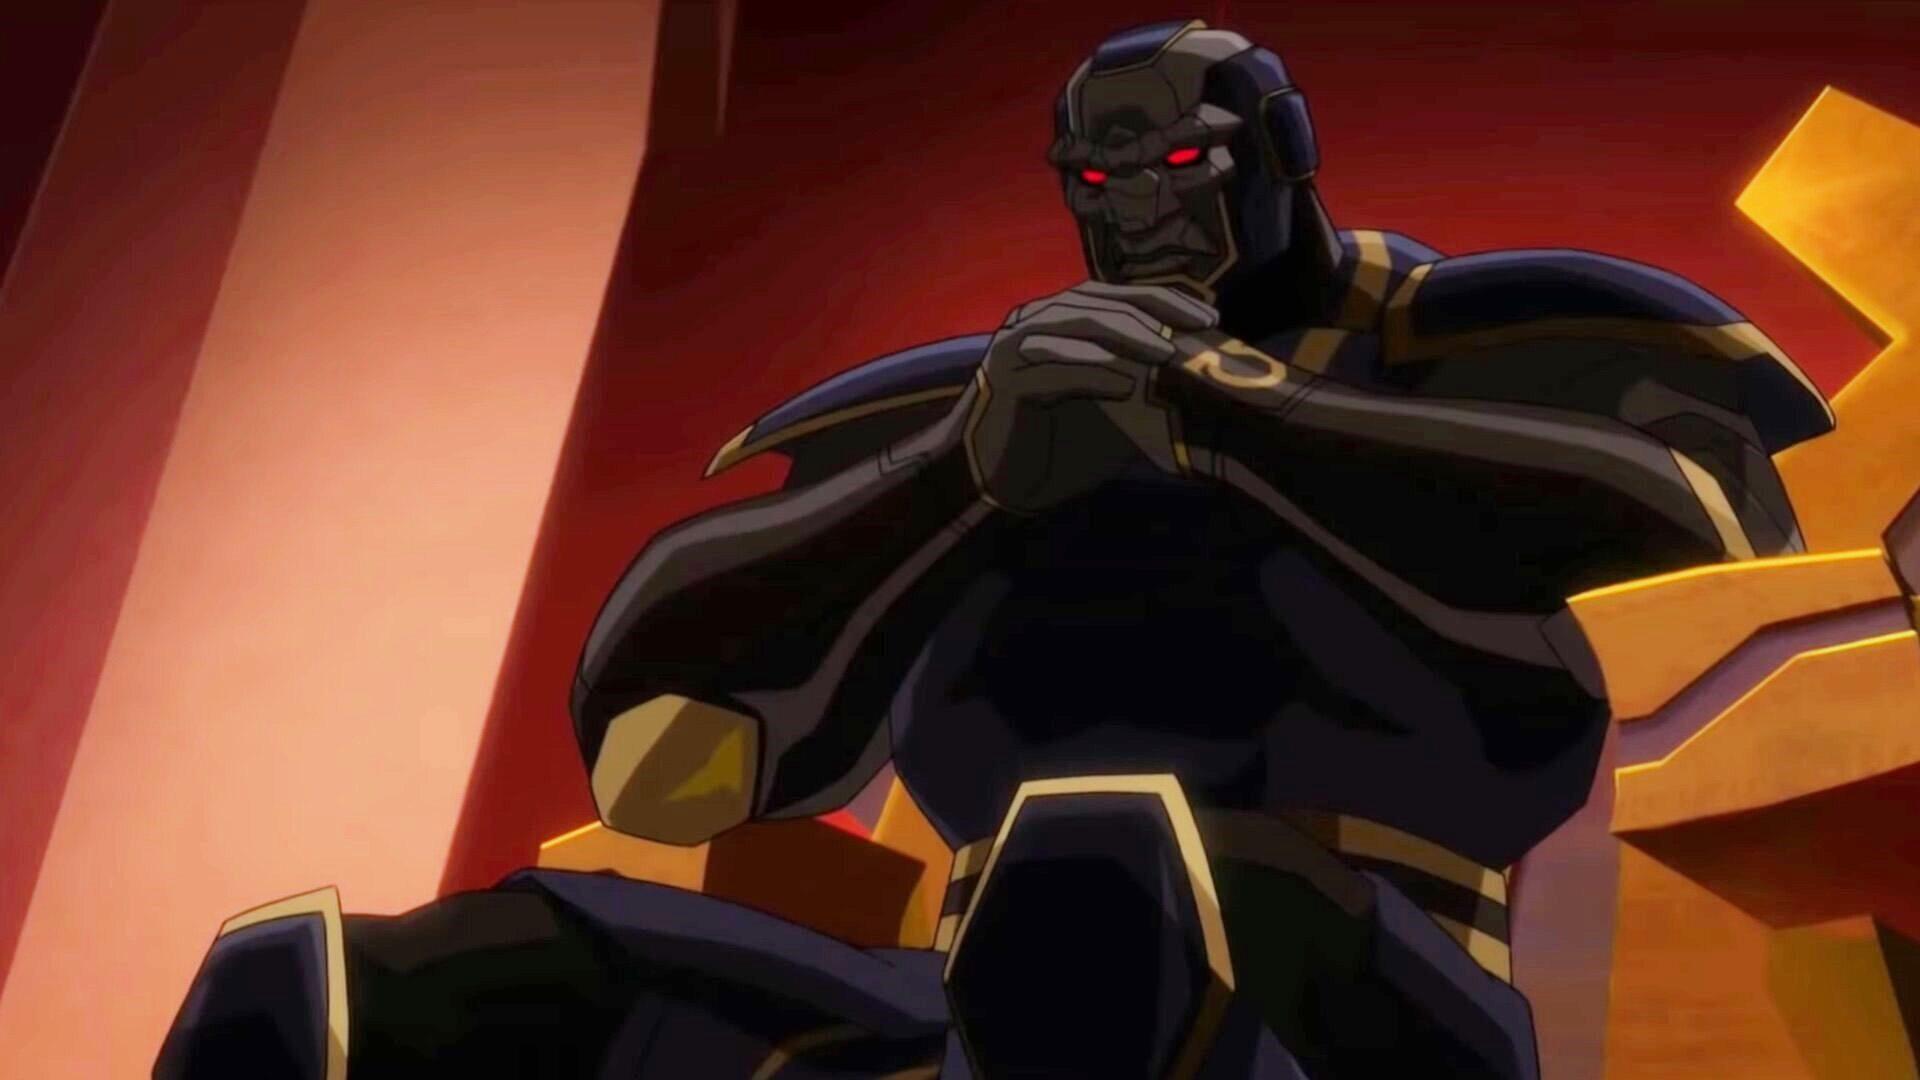 Darkseid (voiced by Tony Todd) in Justice League Dark: Apokolips War (2020)